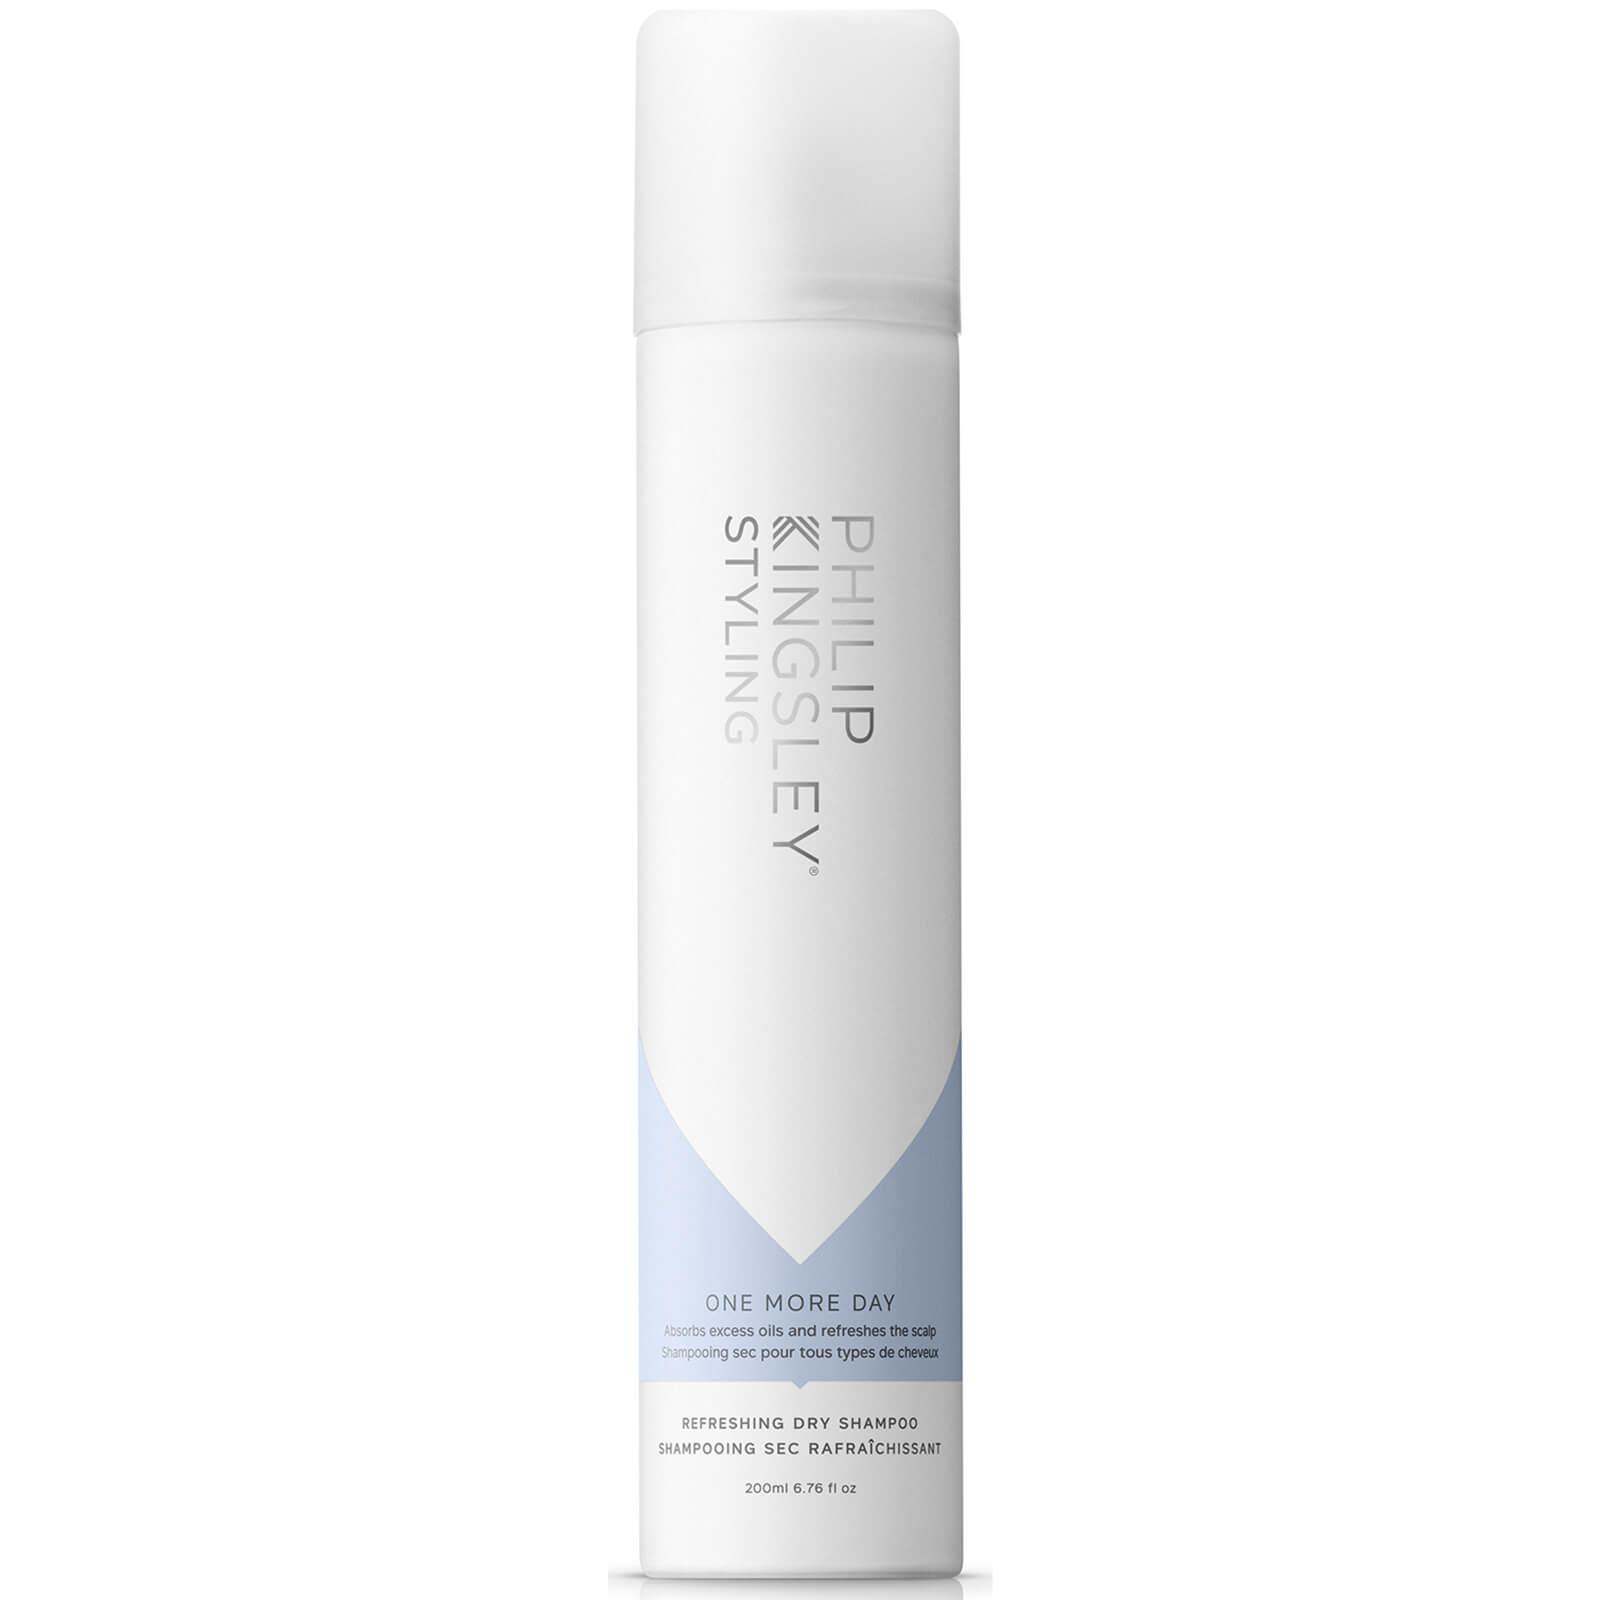 Philip Kingsley - One More Day Dry Shampoo 200 ml